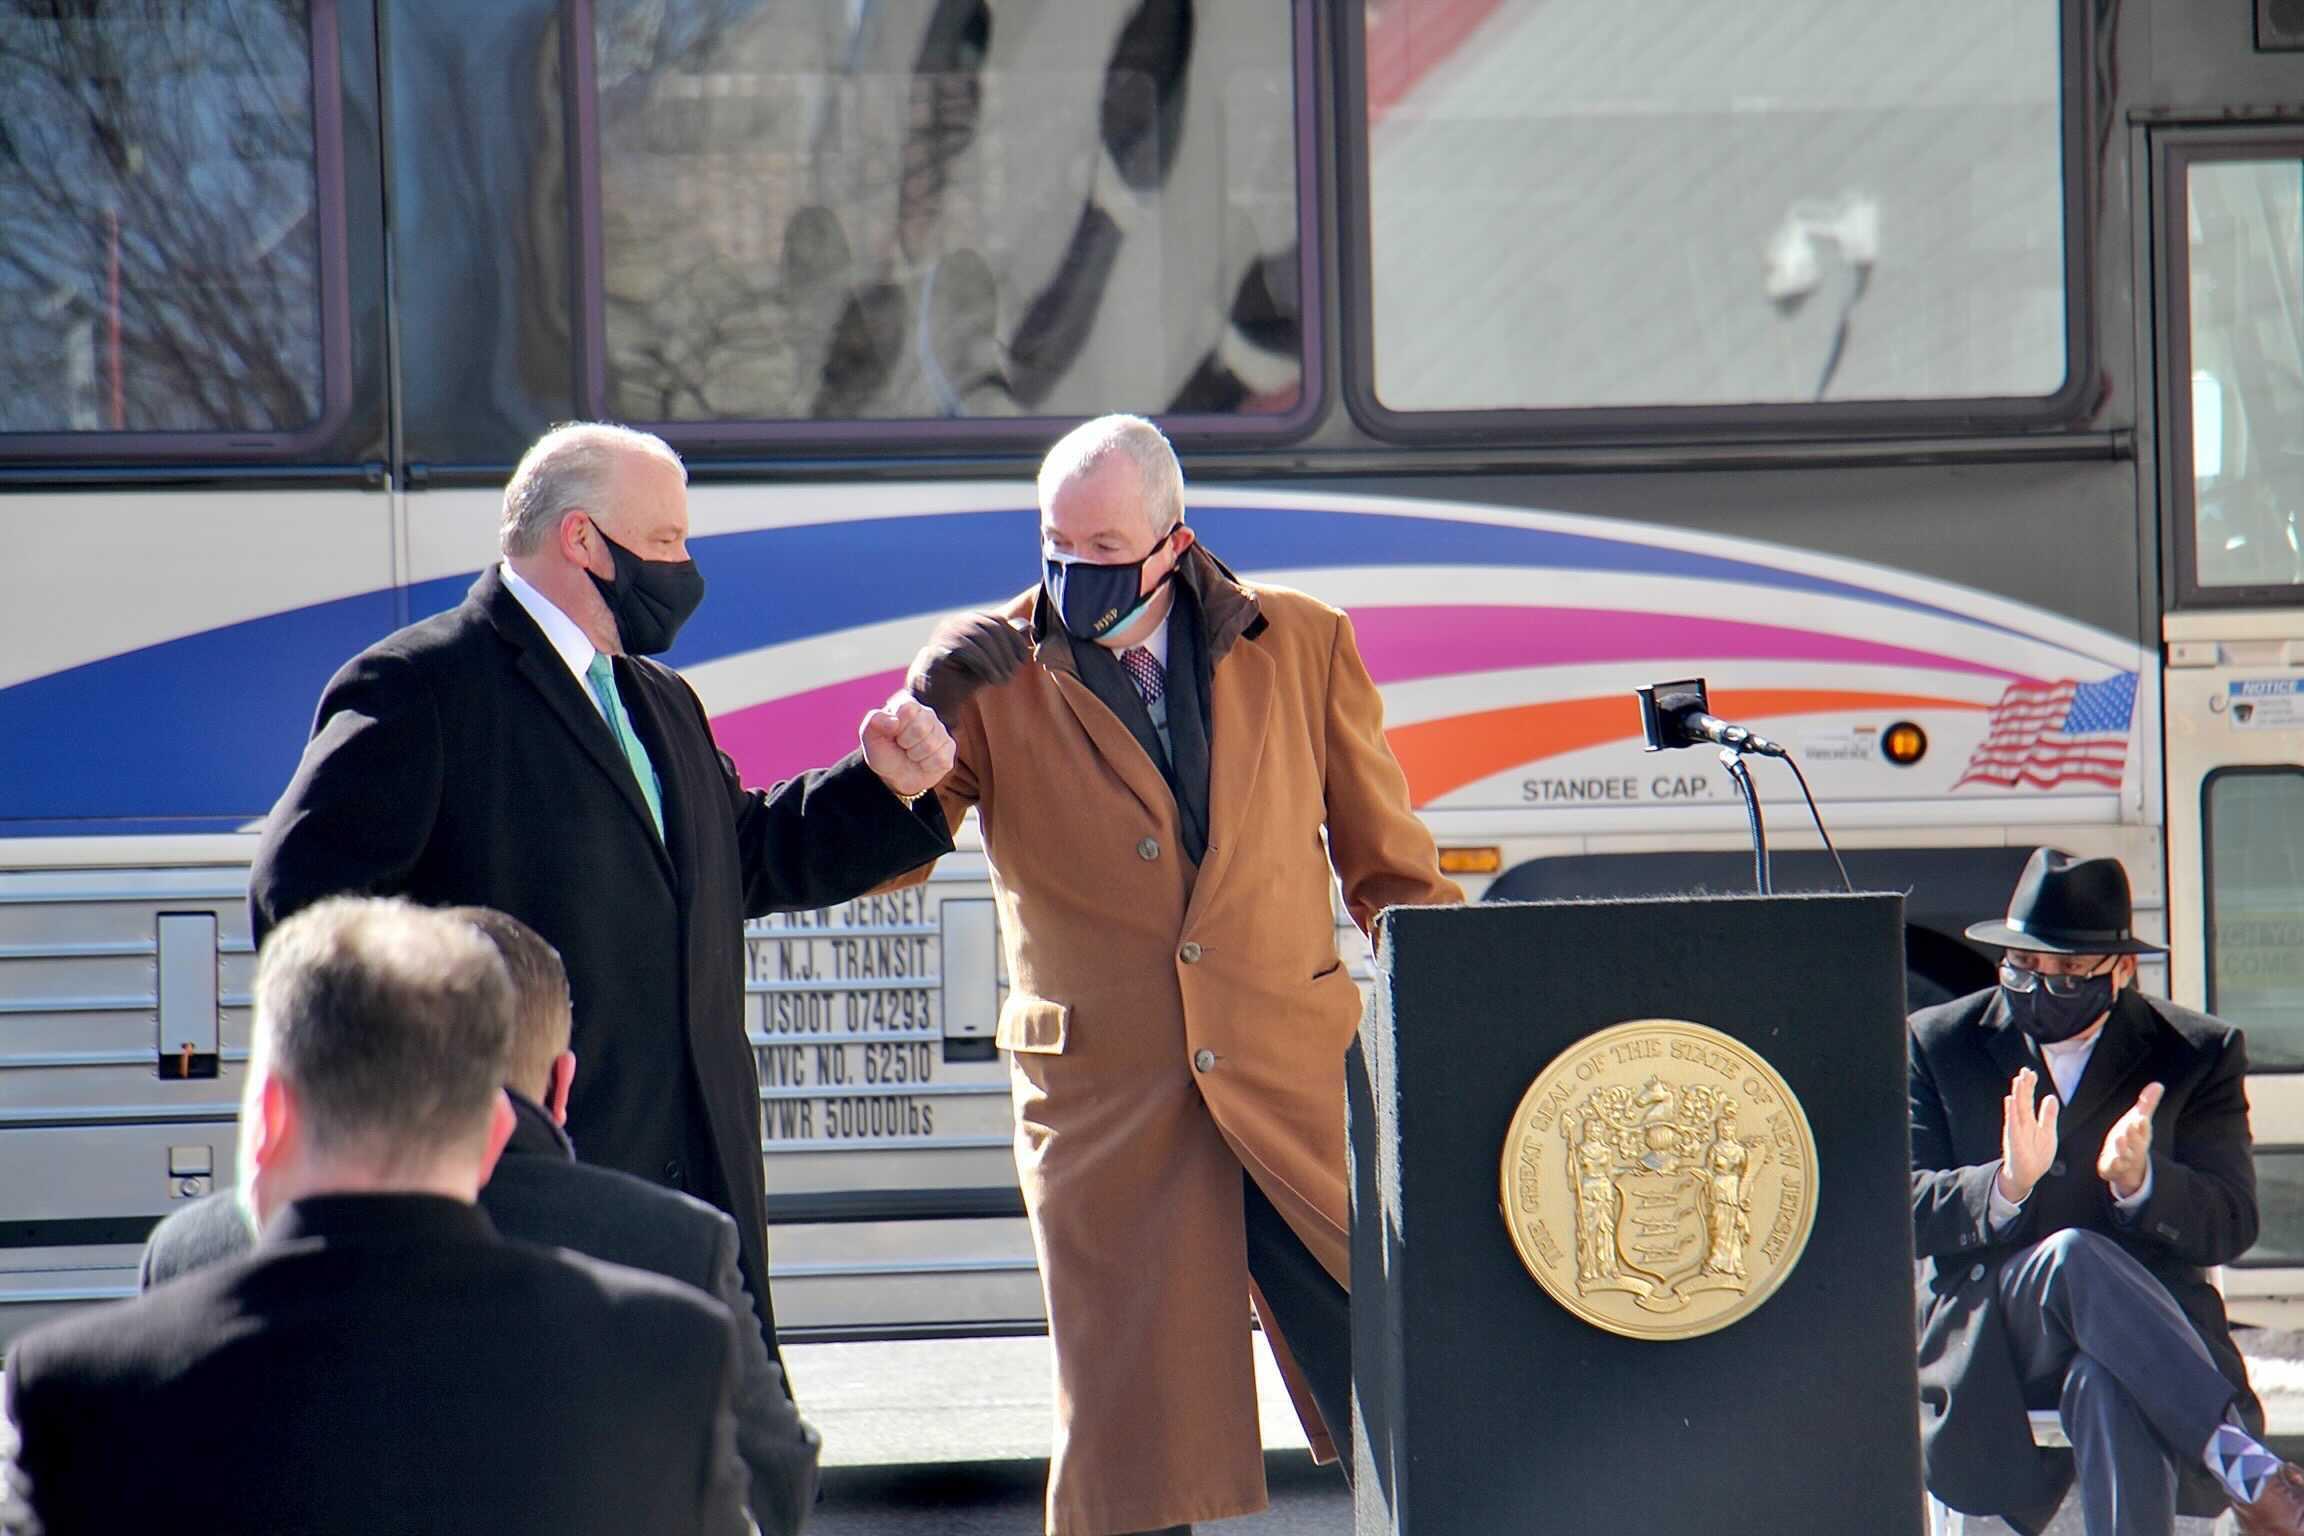 New Jersey Gov. Phil Murphy elbow bumps Senate President Steve Sweeney